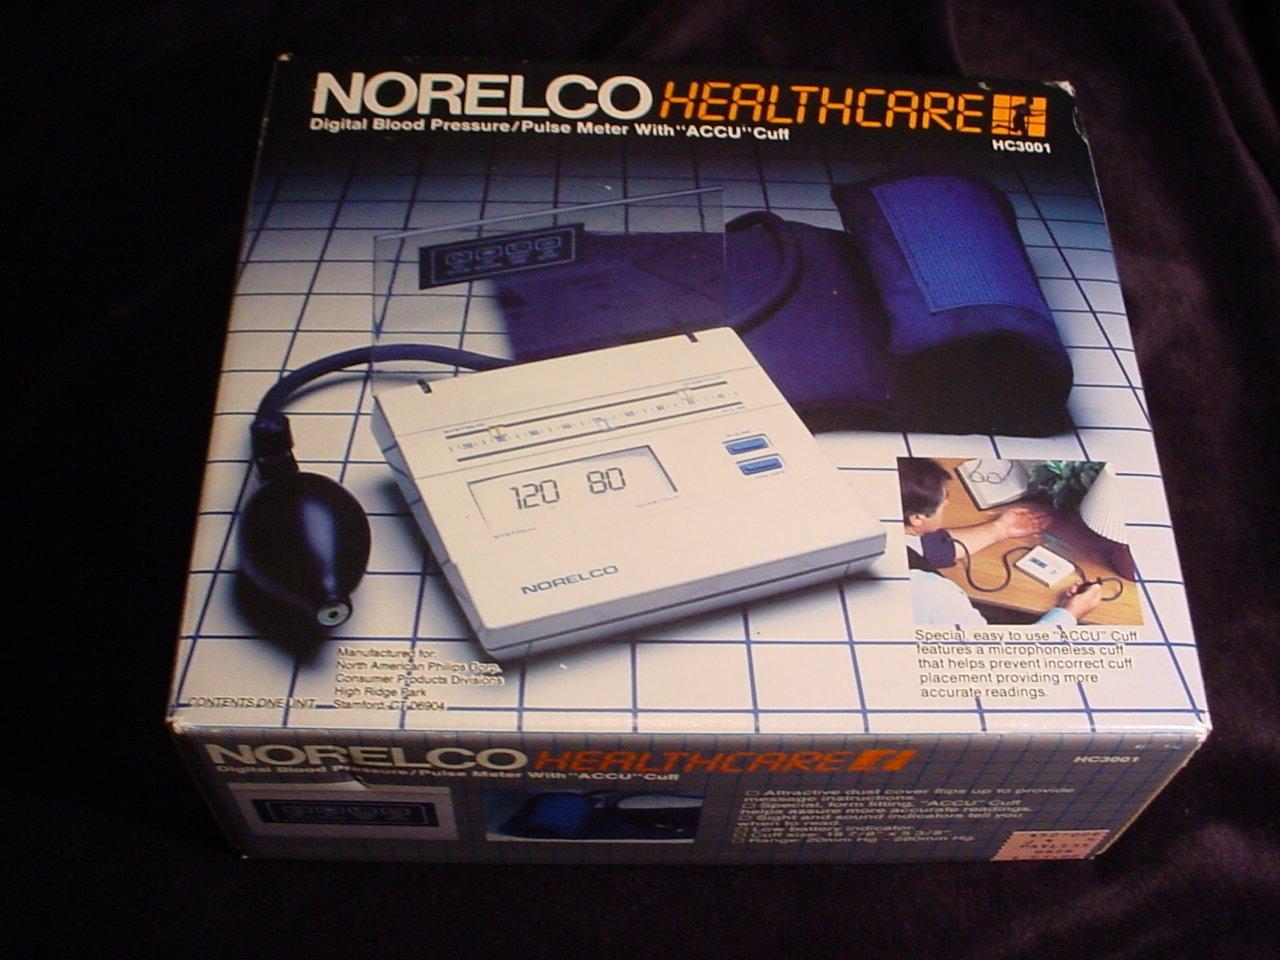 Amazon.com : Norelco Healthcare HC3001 Digital Blood Pressure/Pulse Meter : Automatic Blood Pressure Monitors : Beauty